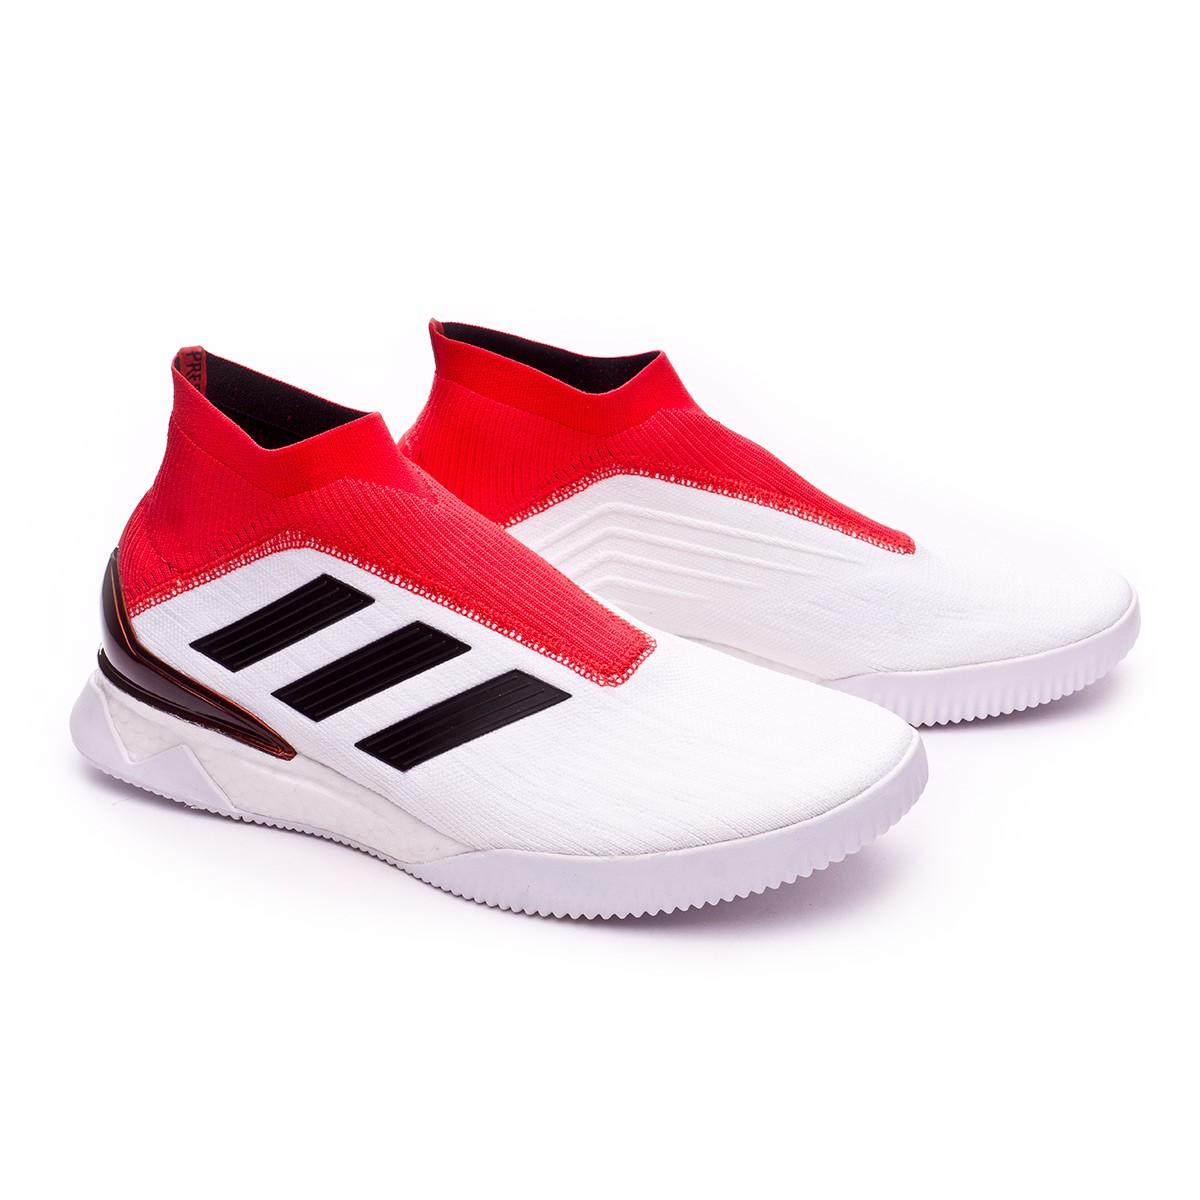 e5a03b08a769d Trainers adidas Predator Tango 18+ TR UltraBoost White-Core black ...